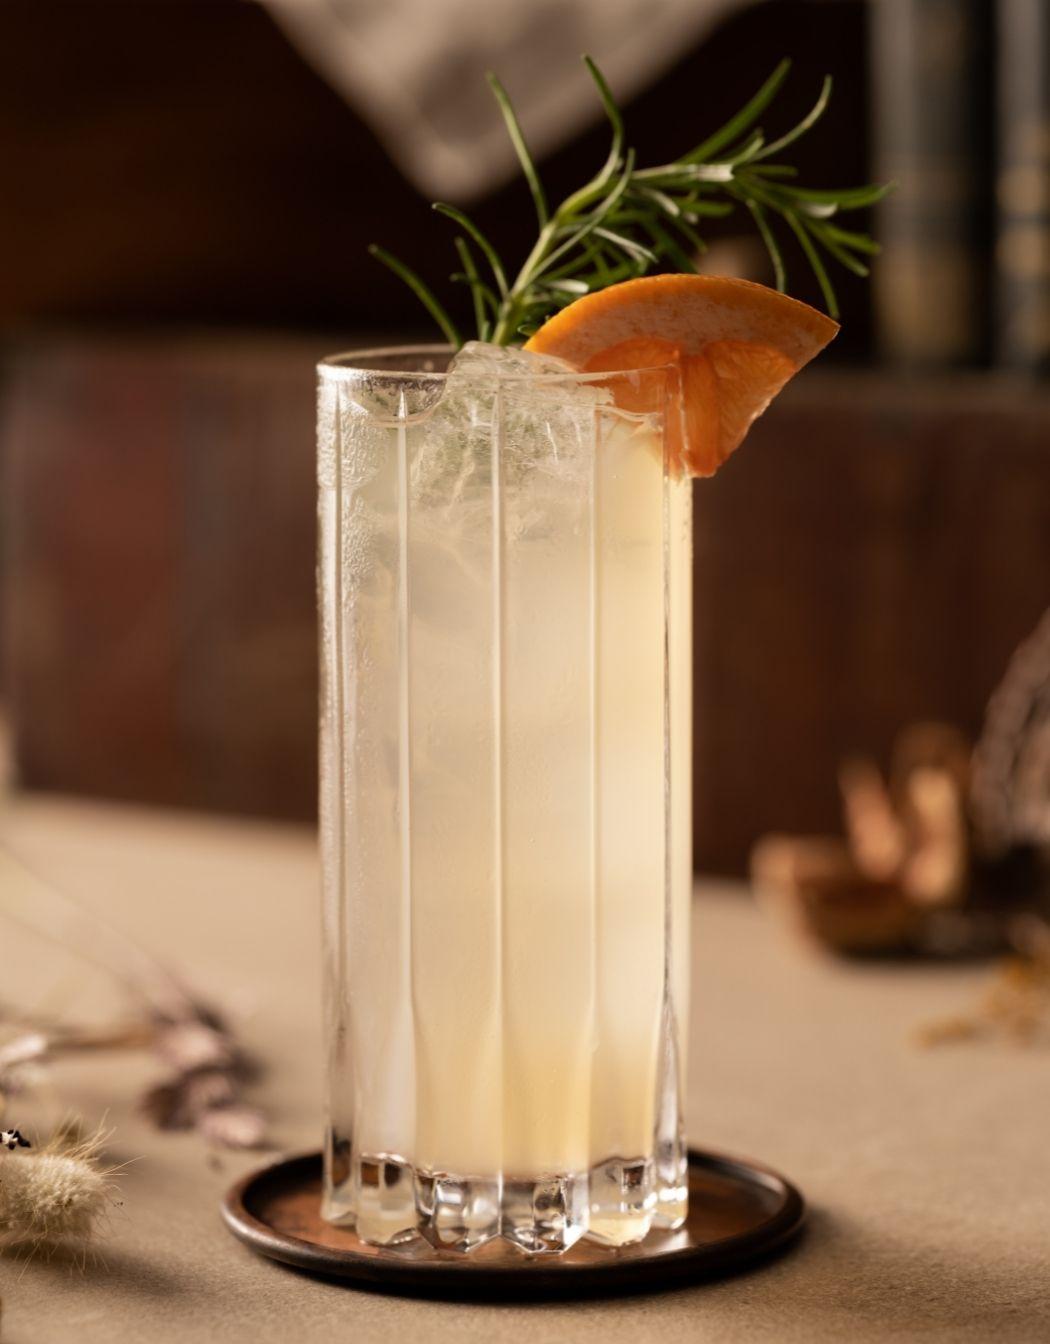 La Causa cocktail